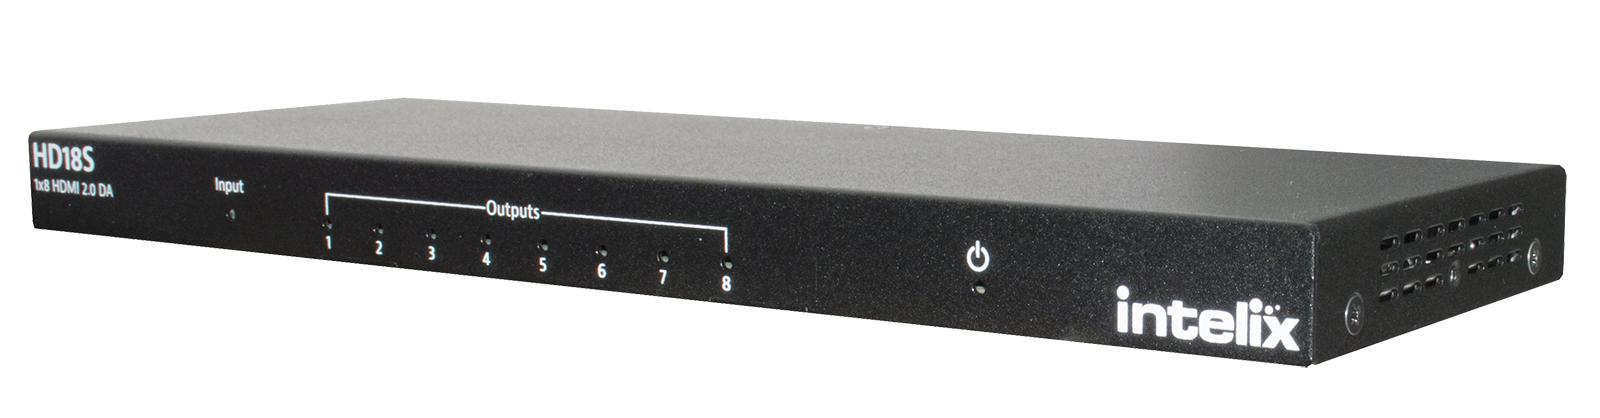 1x8 HDMI 2.0 Distribution Amplifier